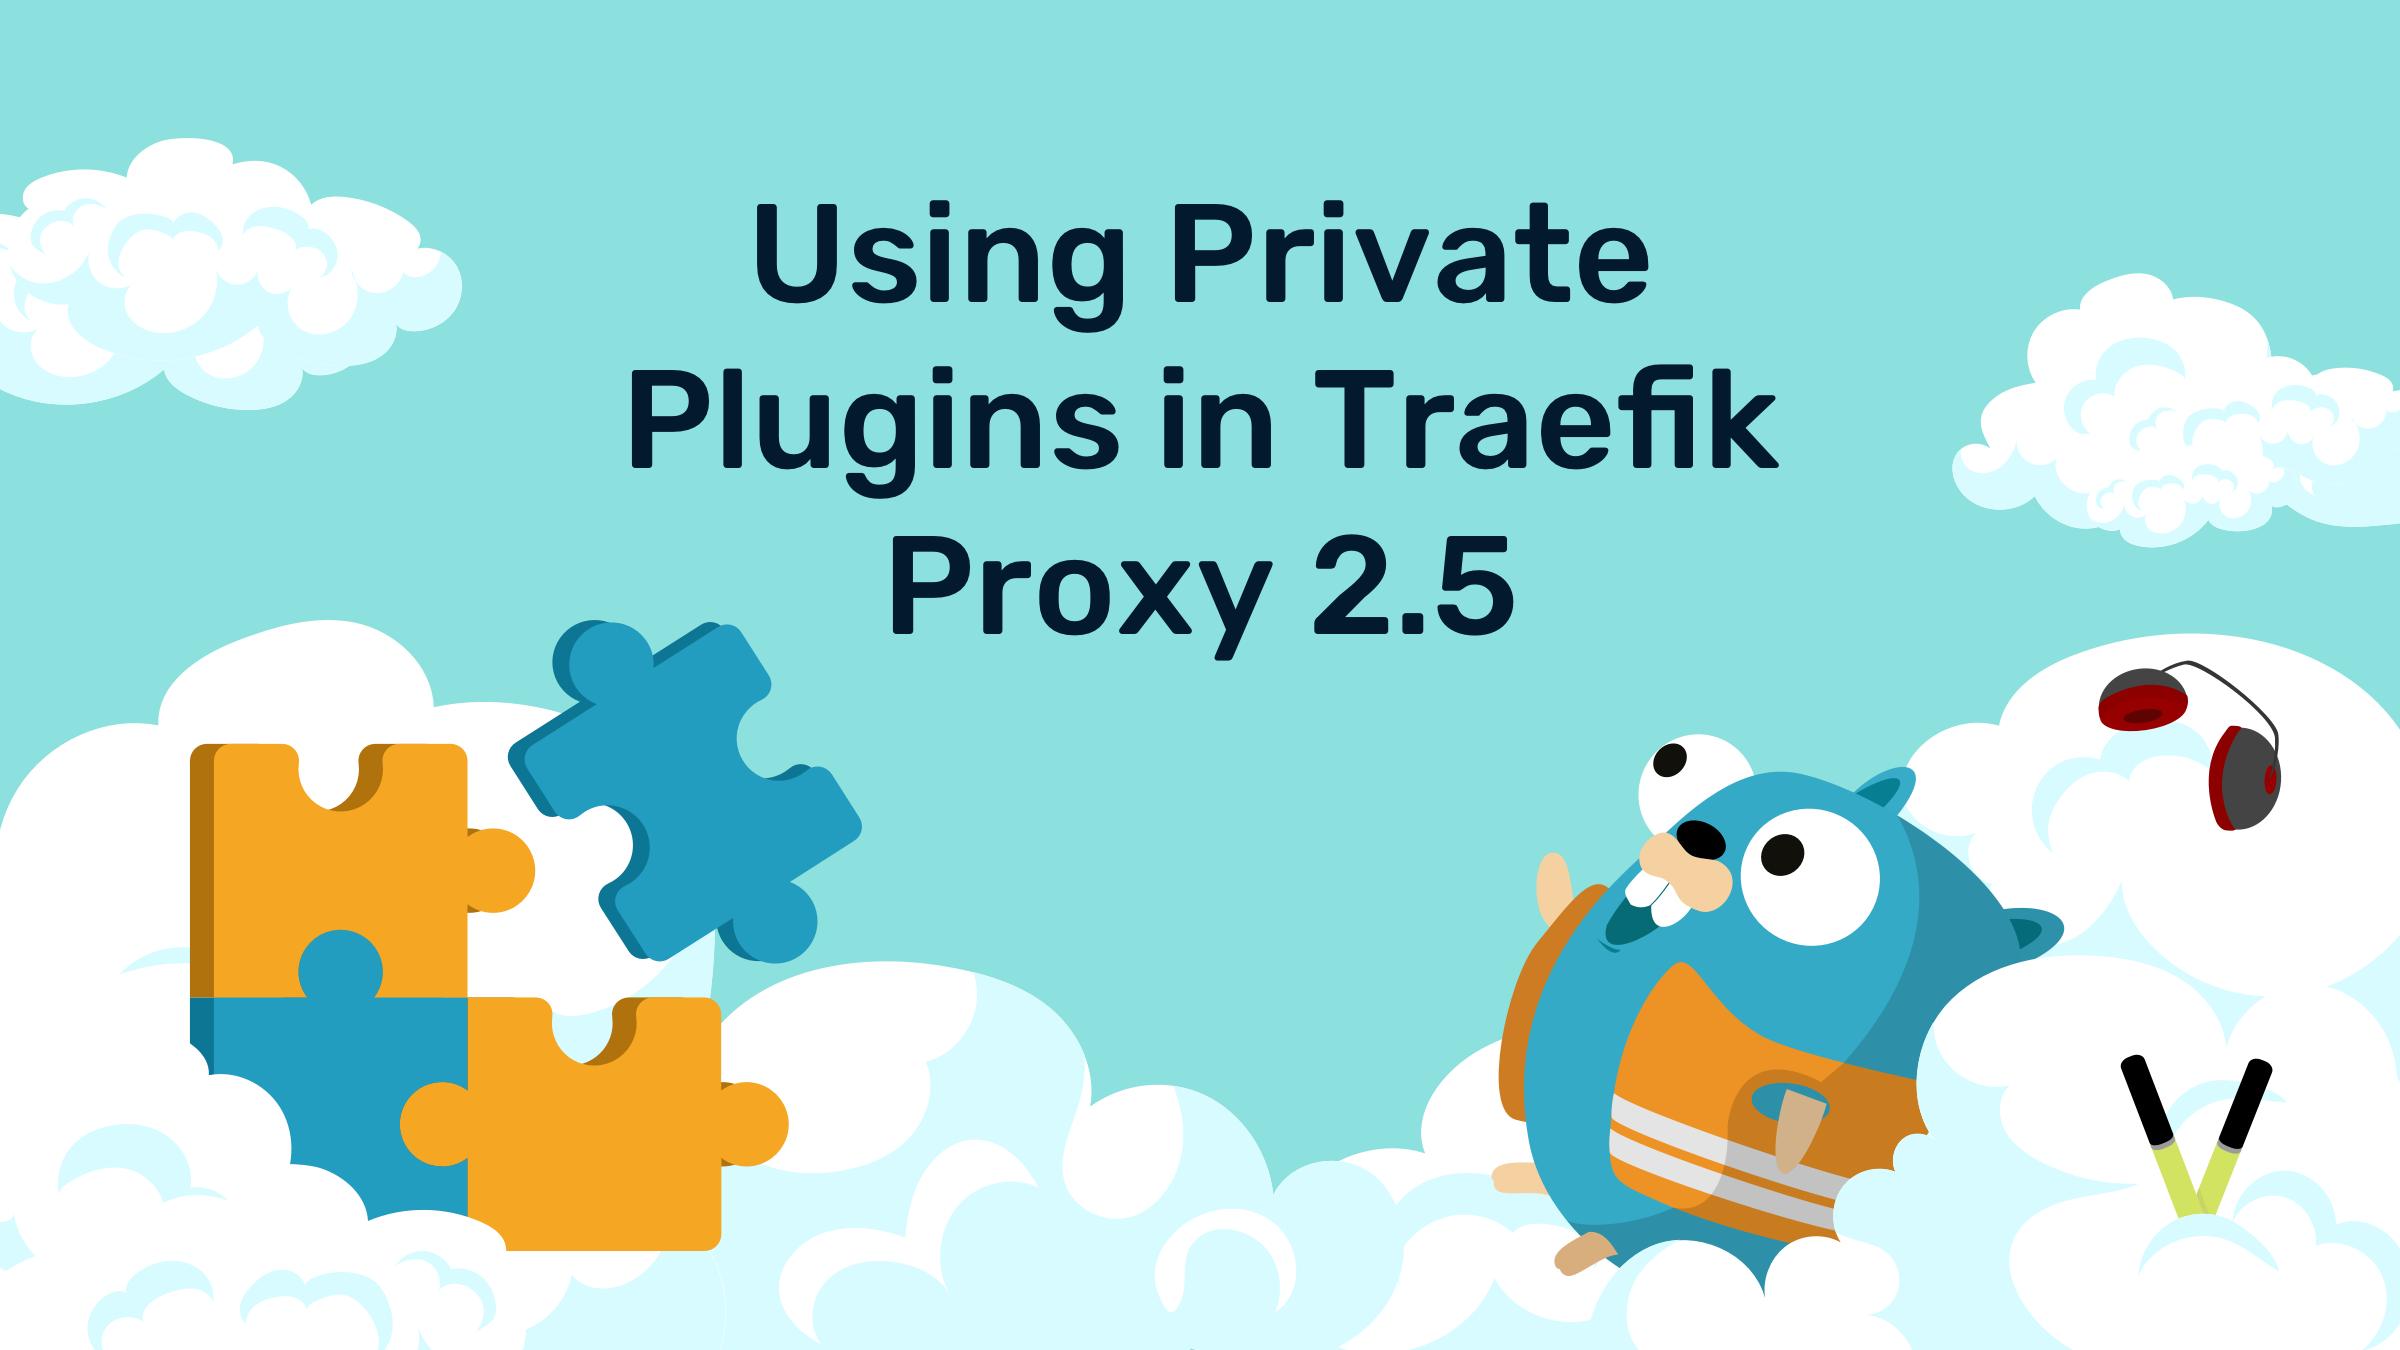 Using Private Plugins in Traefik Proxy 2.5